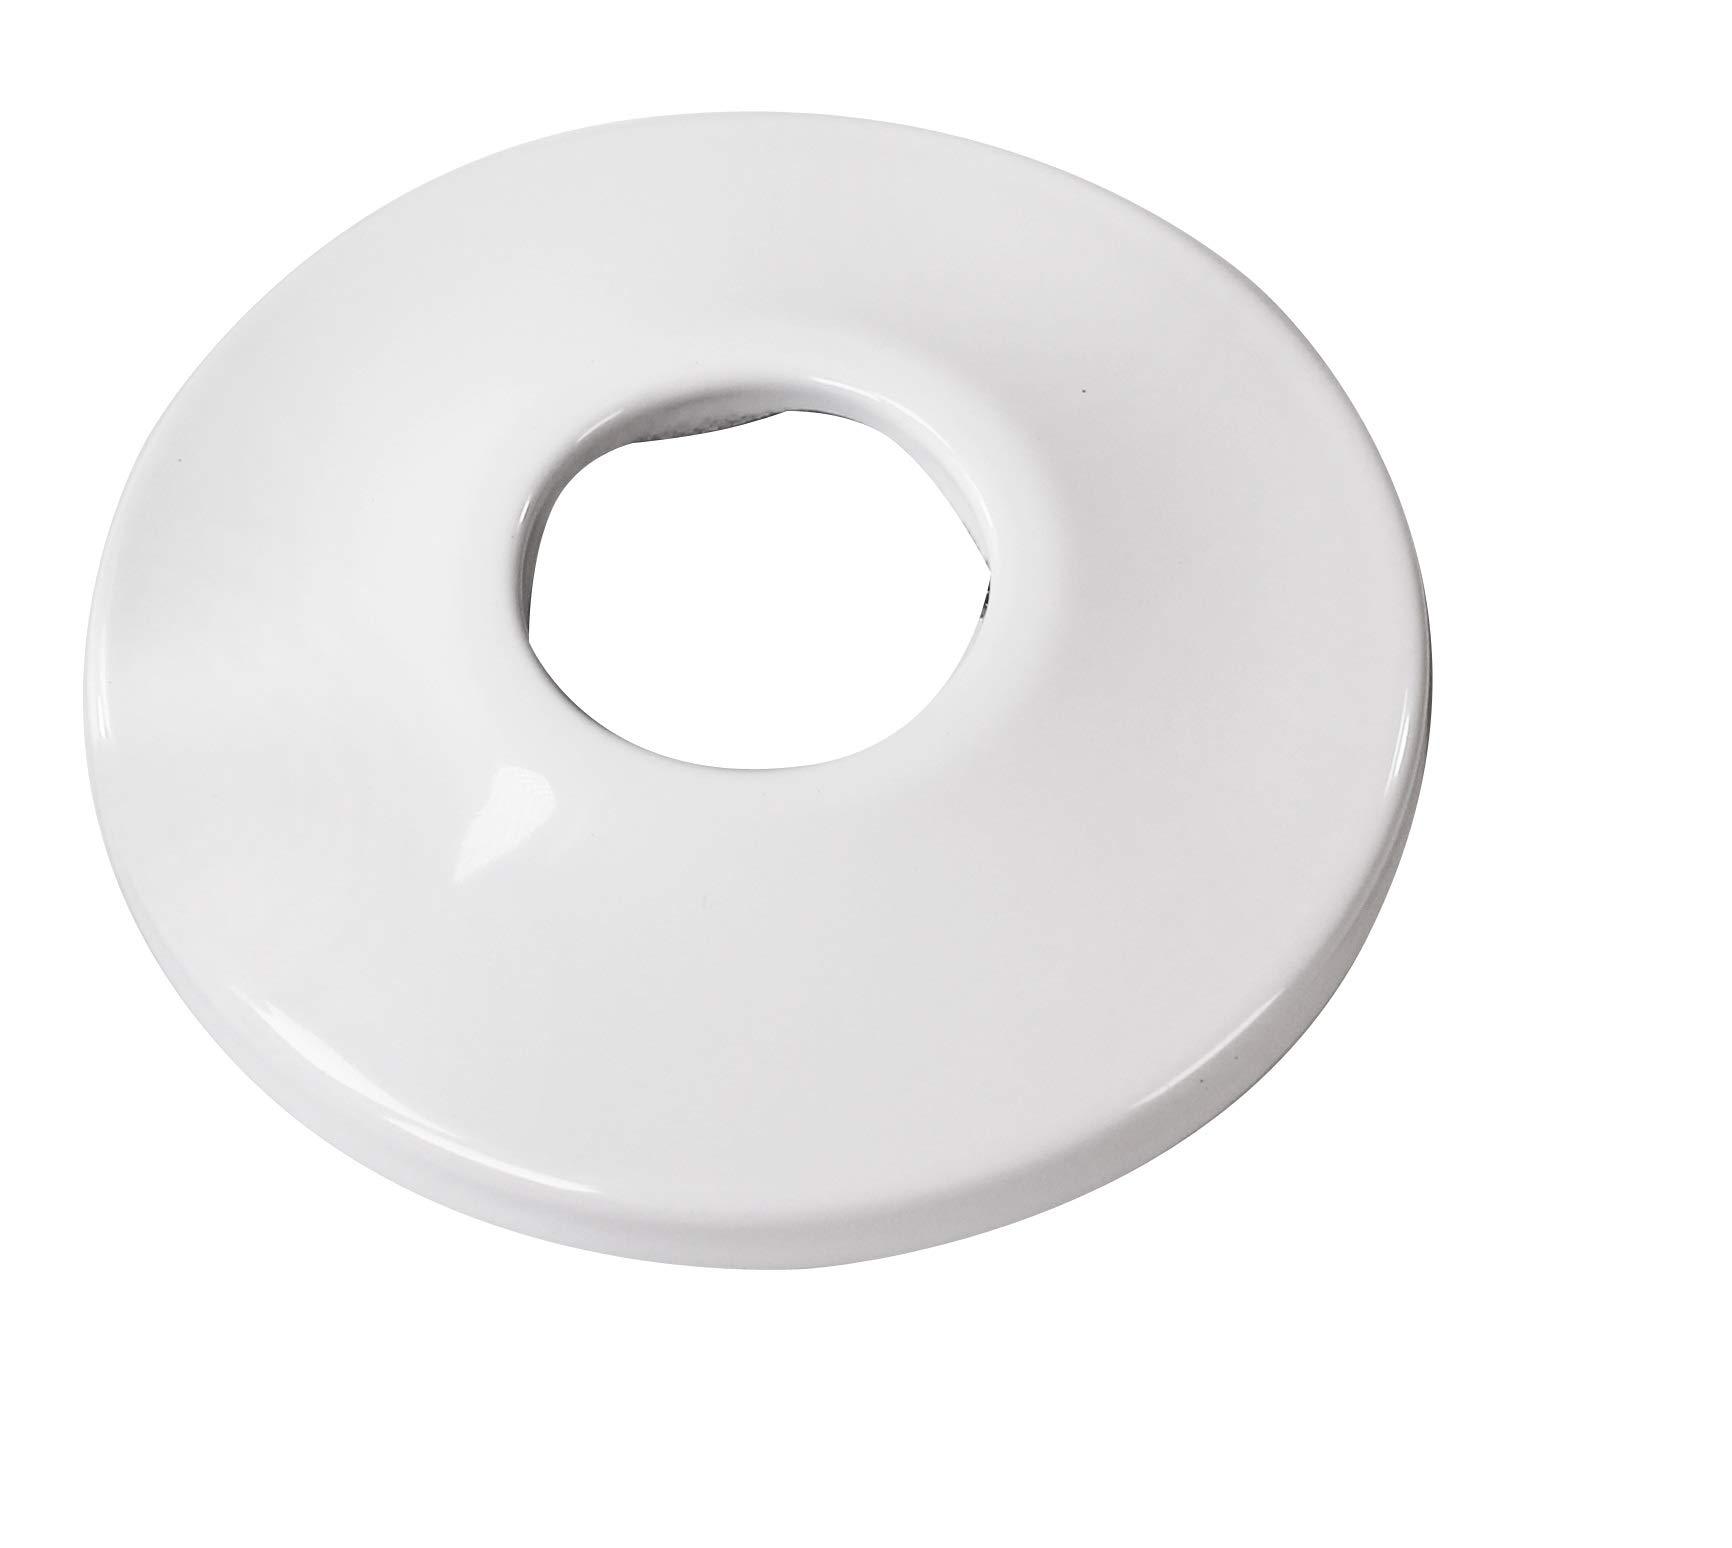 WestBrass D129 Powdercoated White 1/2 in. IPS Low Pattern Sure Grip Flange